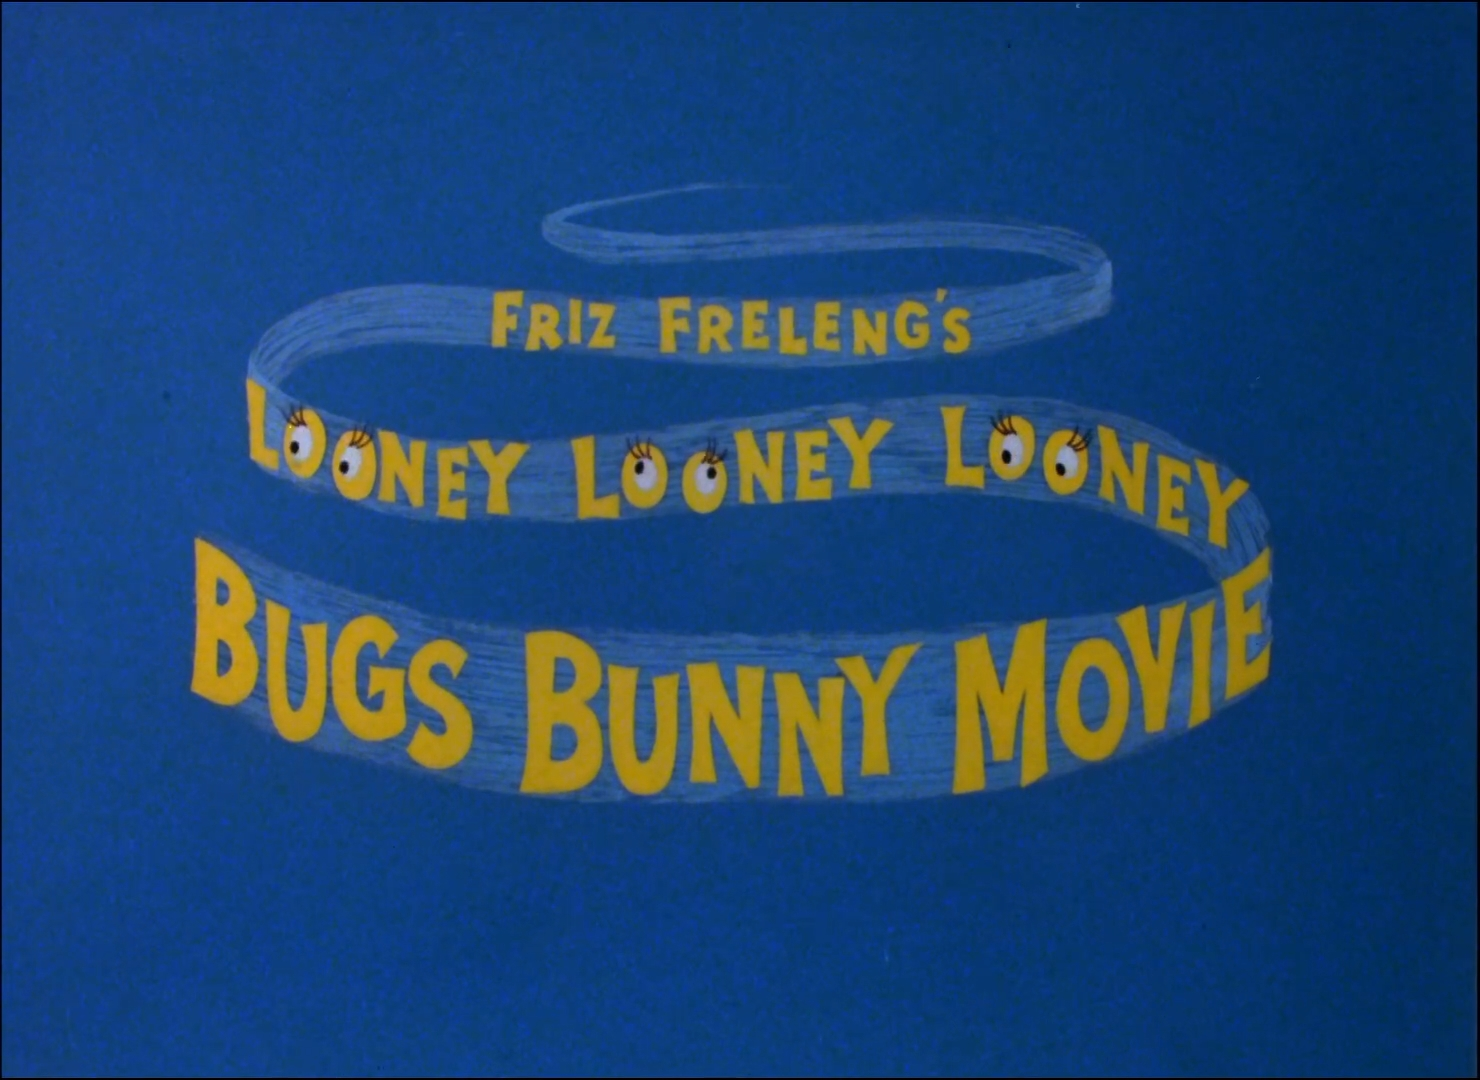 Looney Looney Looney Bugs Bunny la pelicula (1981)|1080p|Meg